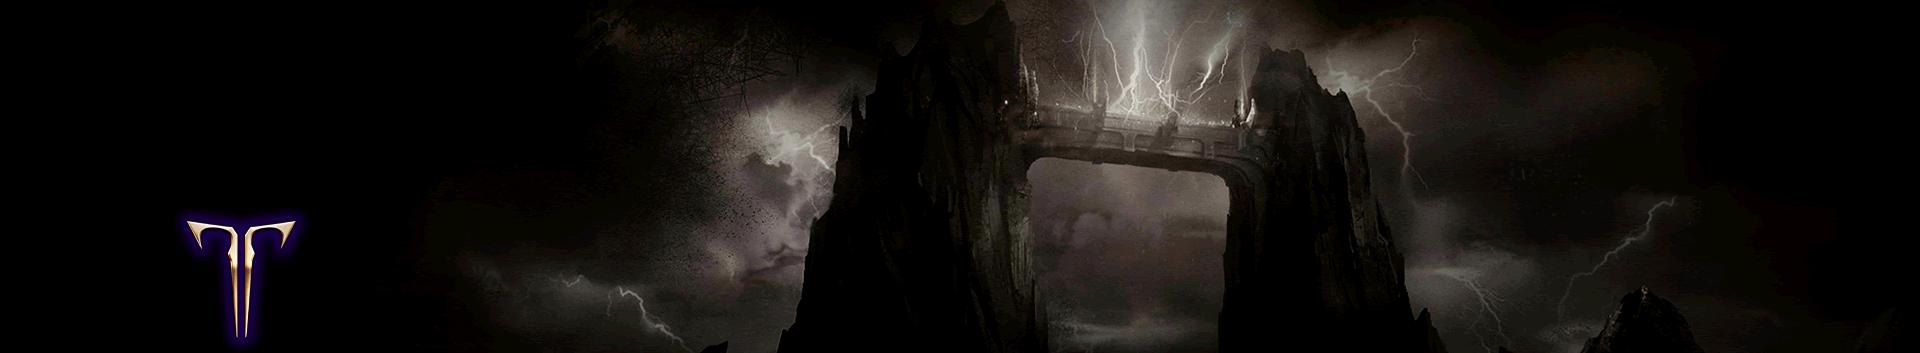 Oscuta imagen ilustrativa de Lost Ark Online